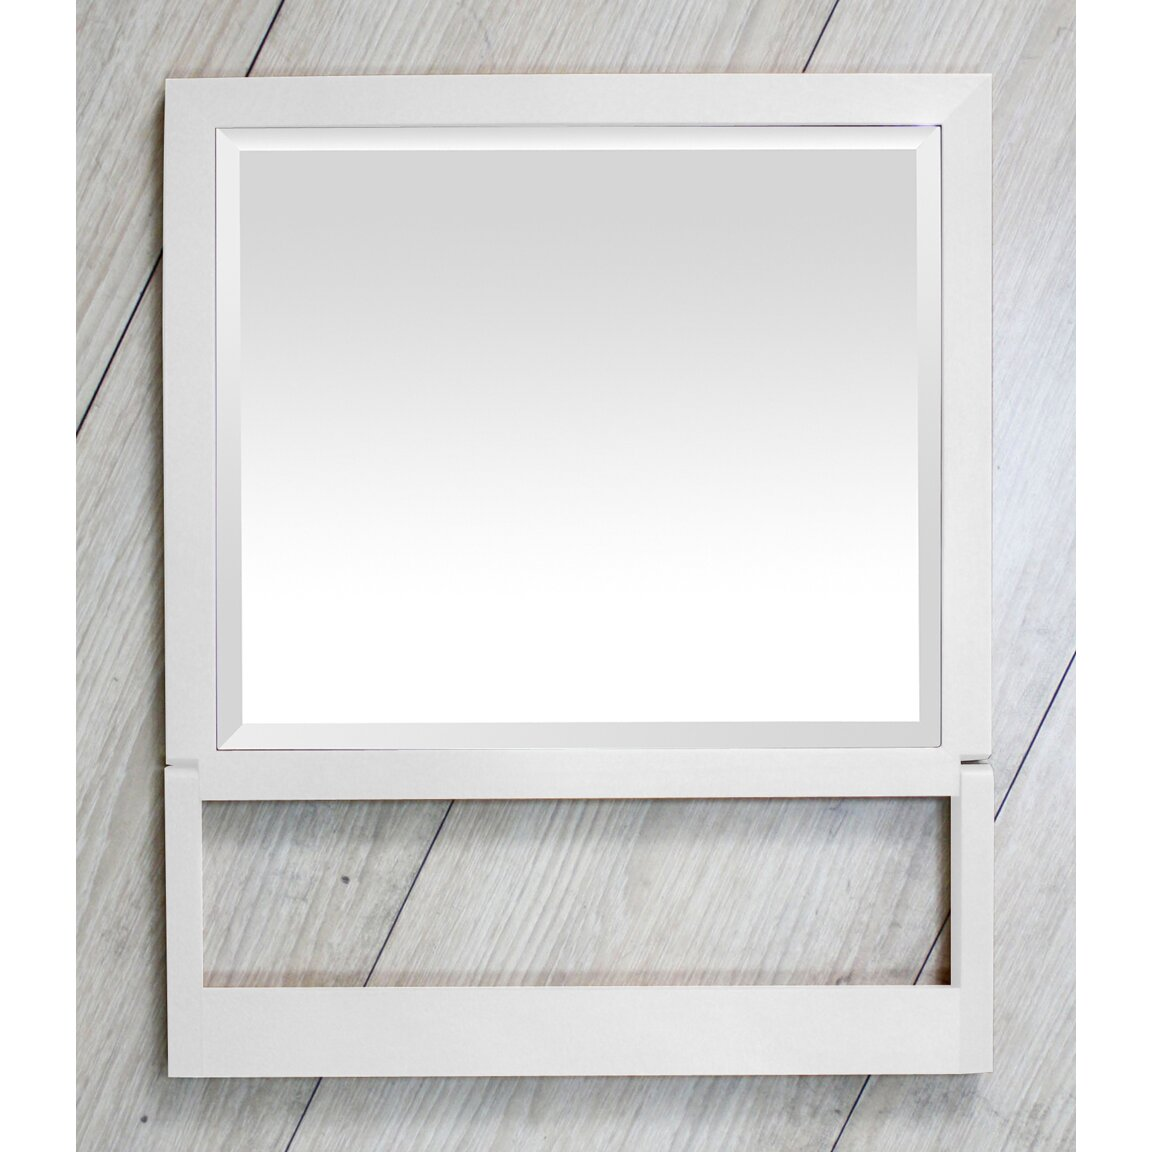 Dcor Design Free Standing Folding Bathroom Travel Mirror Reviews Wayfair Uk